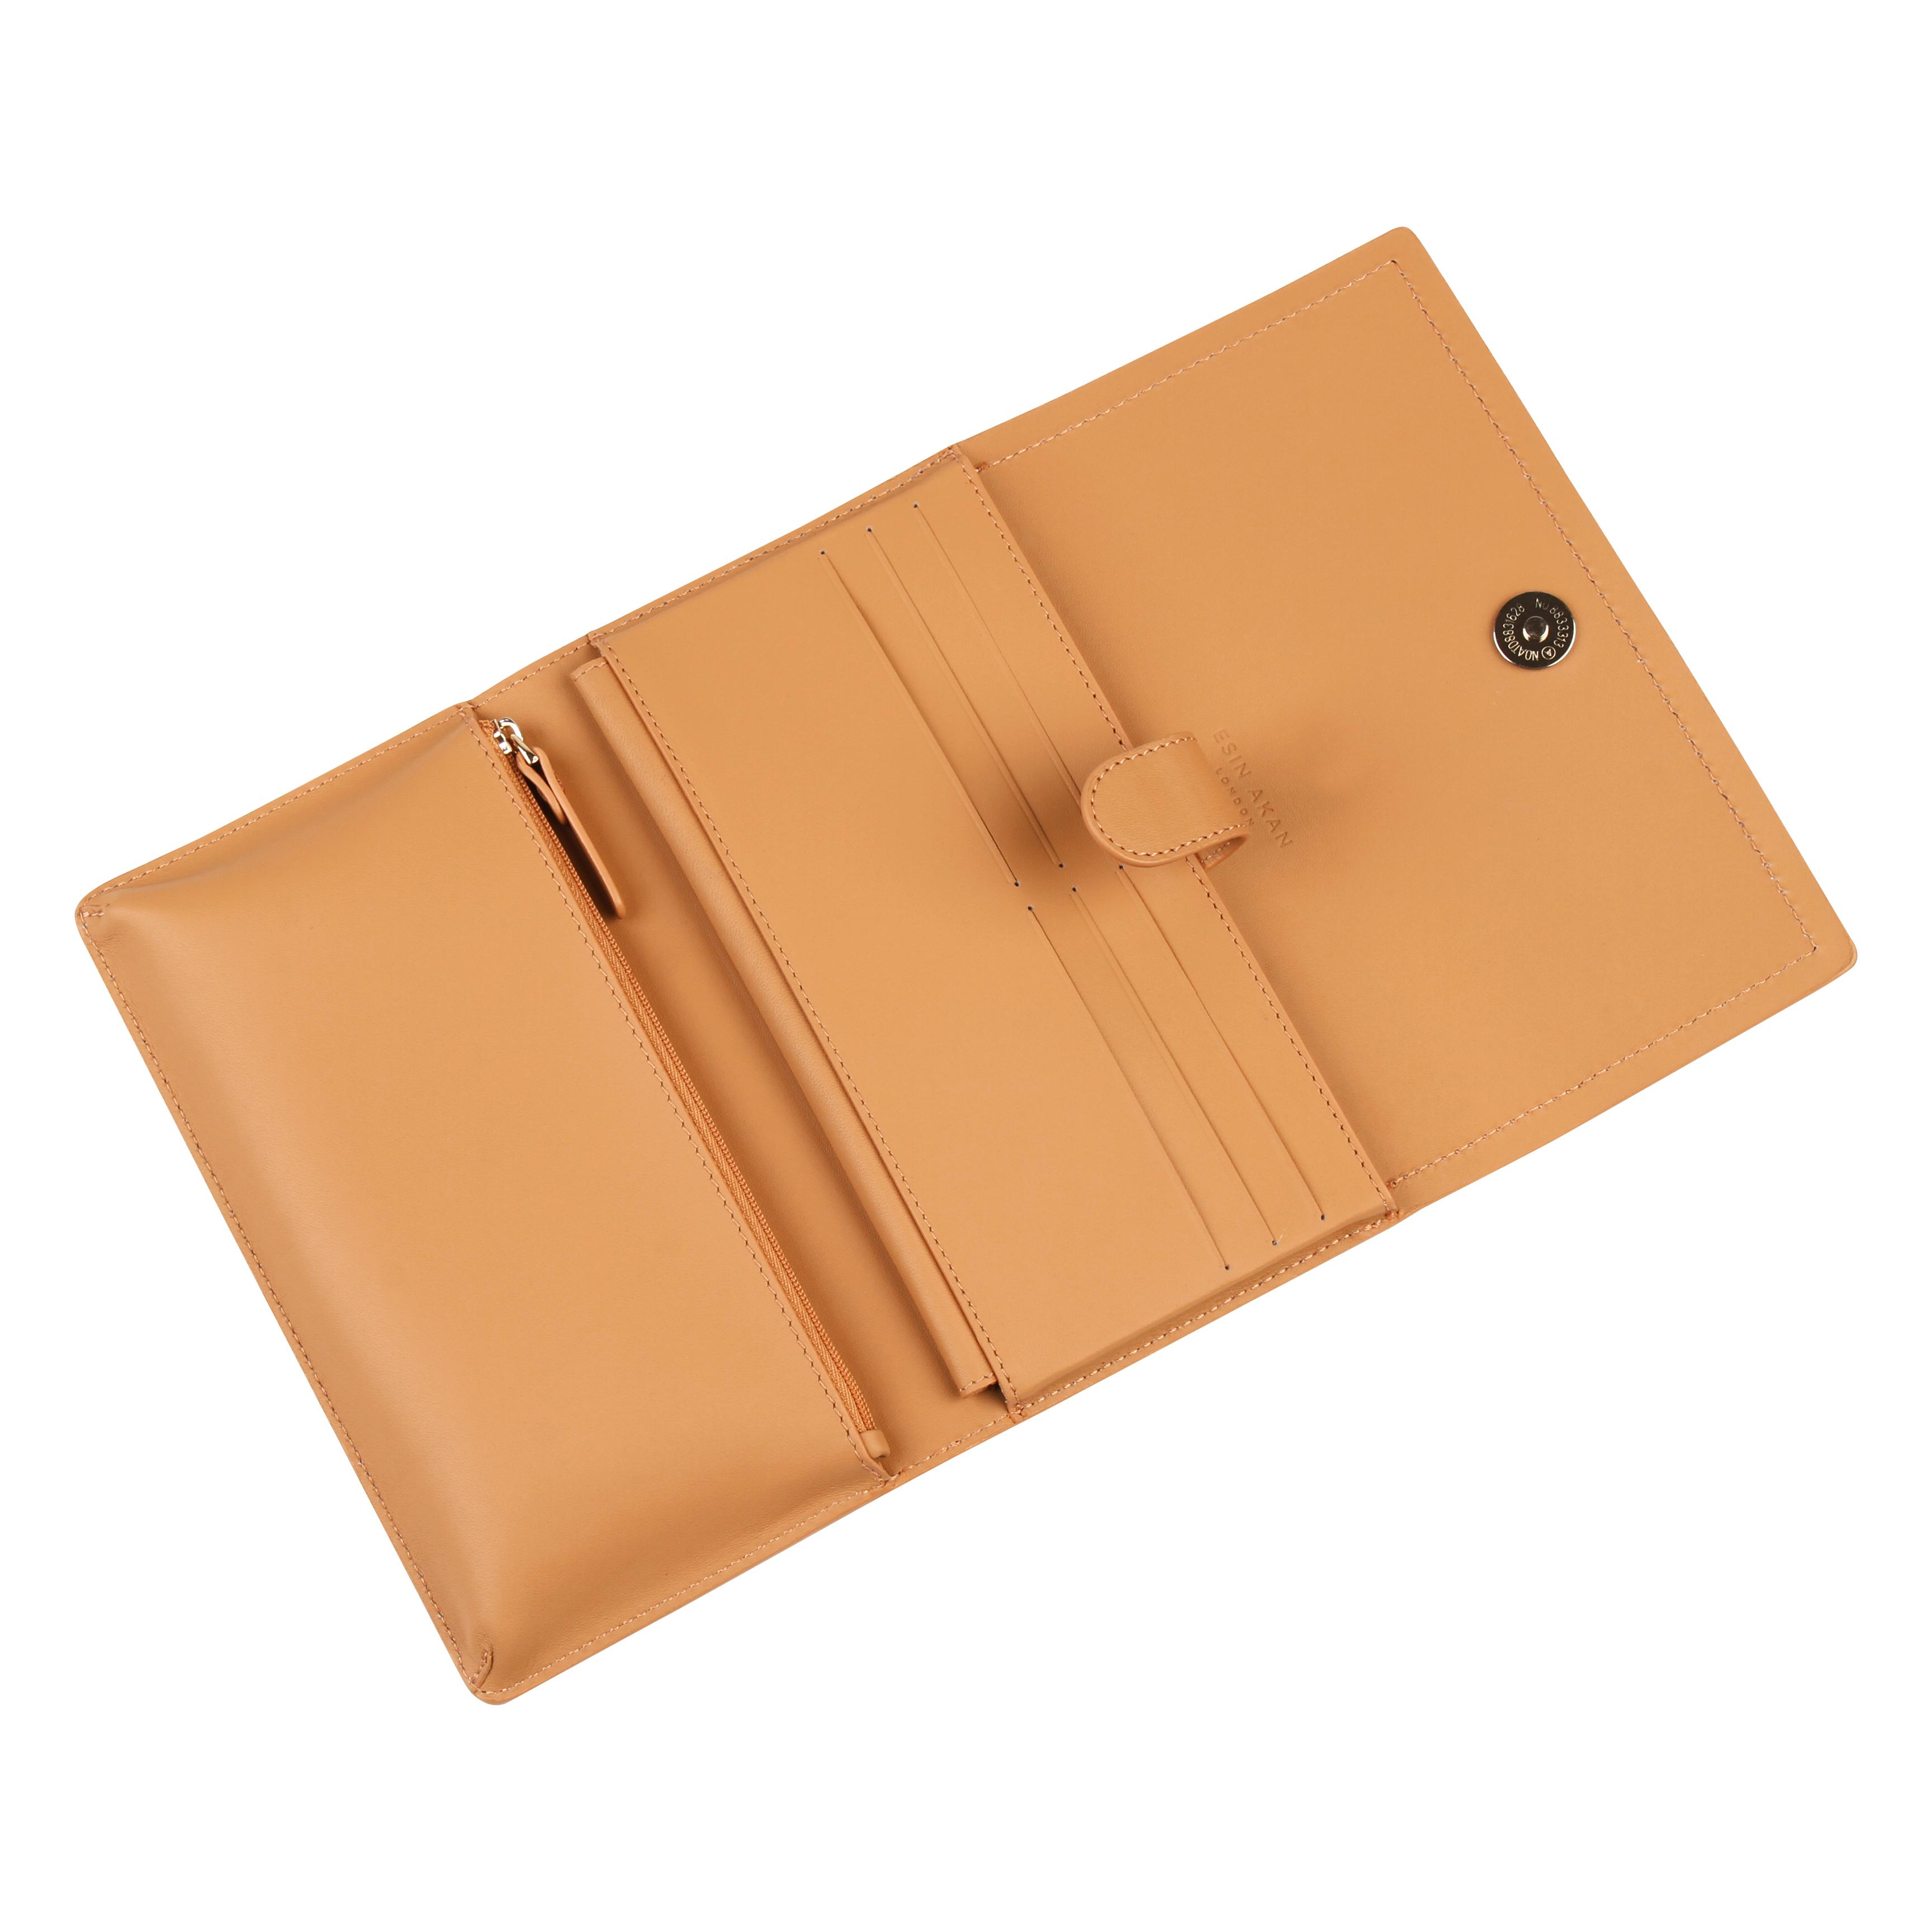 Soho Cross-body Bag - Caramel by Esin Akan on curated-crowd.com